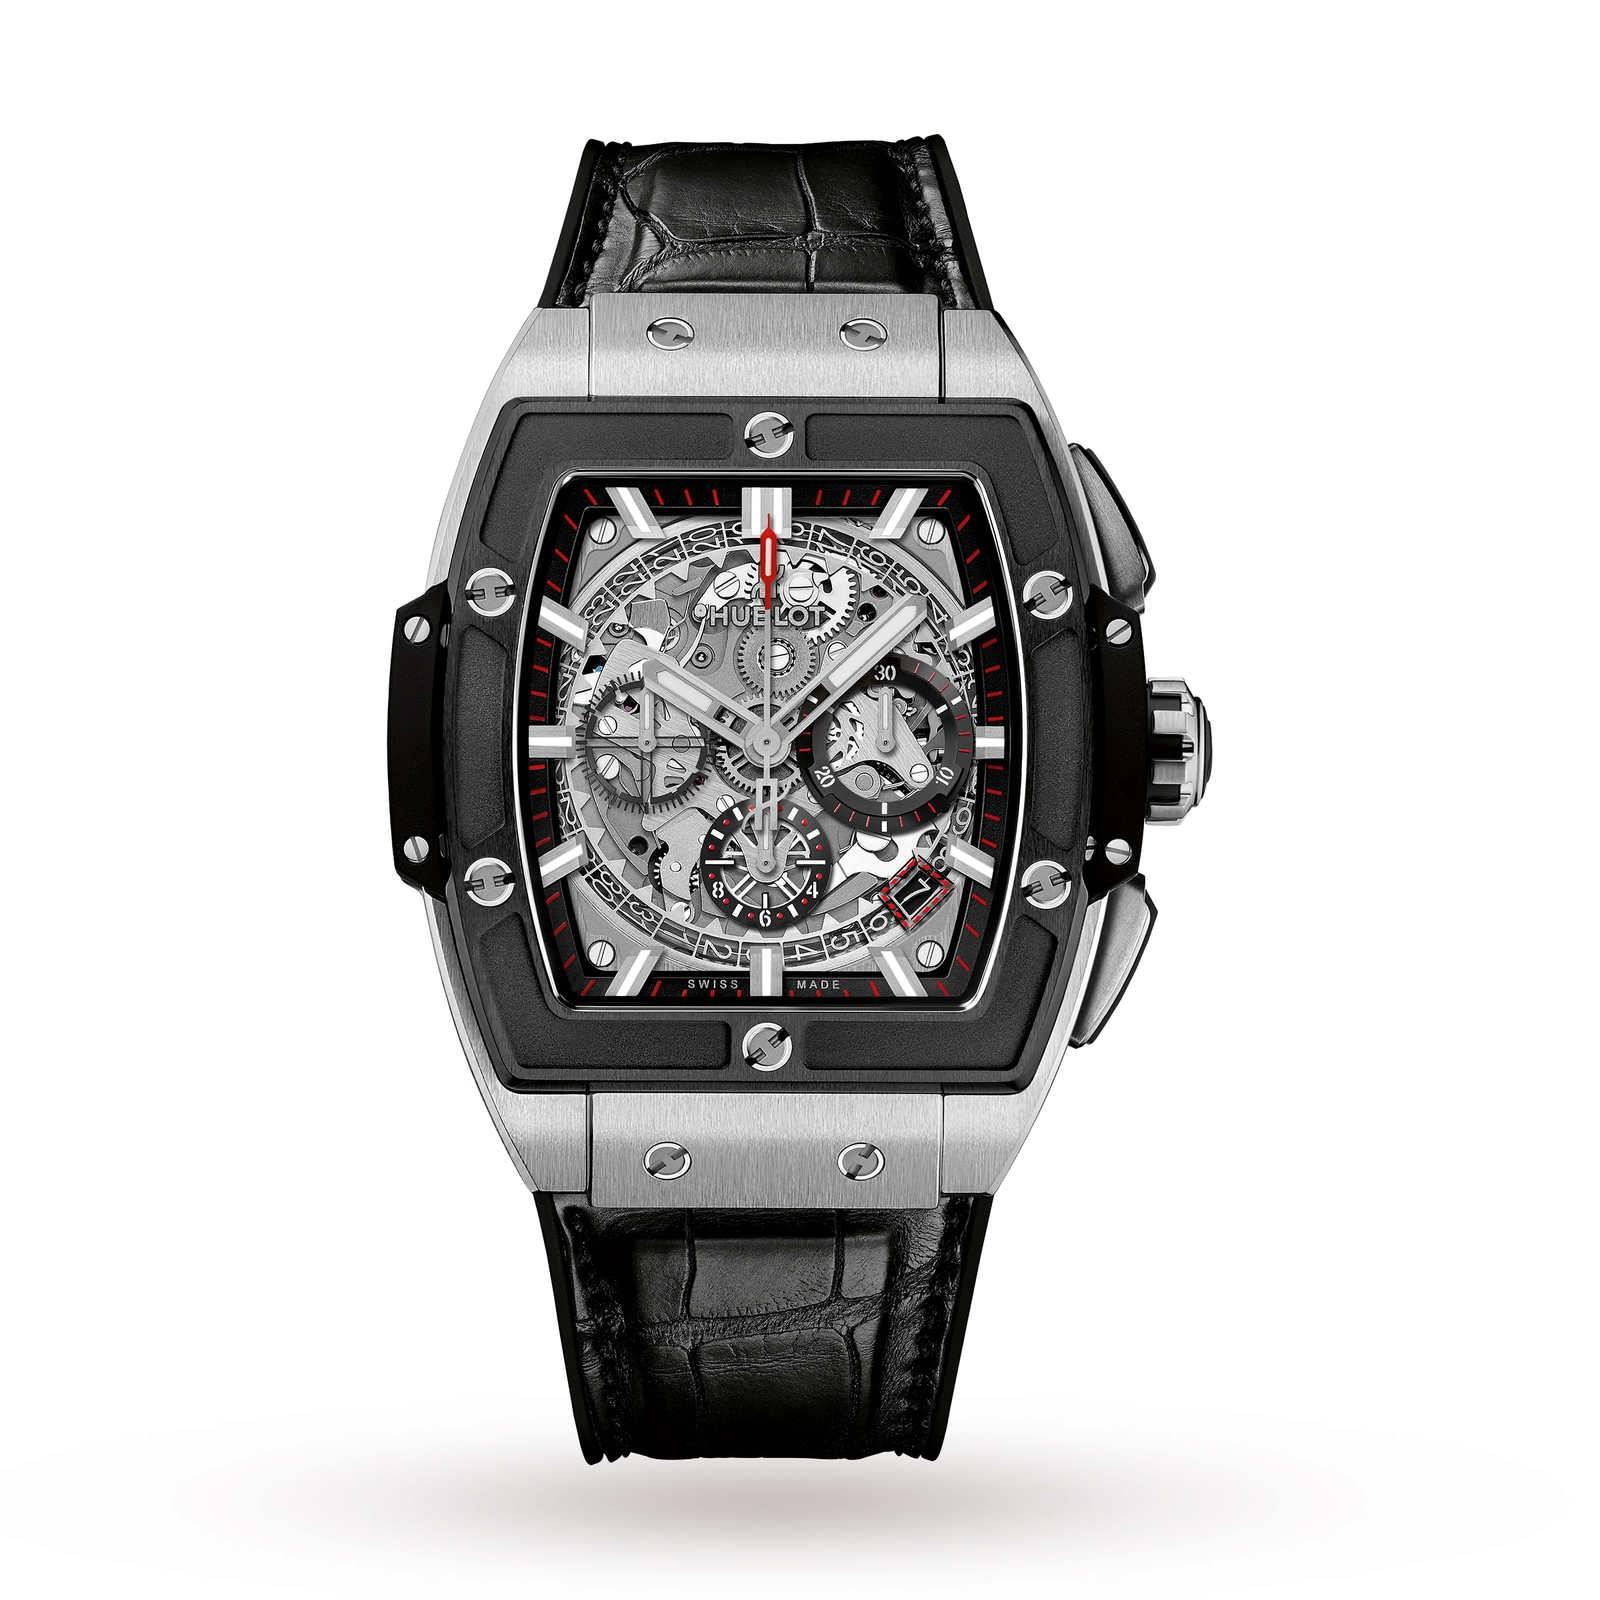 Hublot Hublot Spirit of Big Bang Titanium Ceramic 42mm Mens Watch